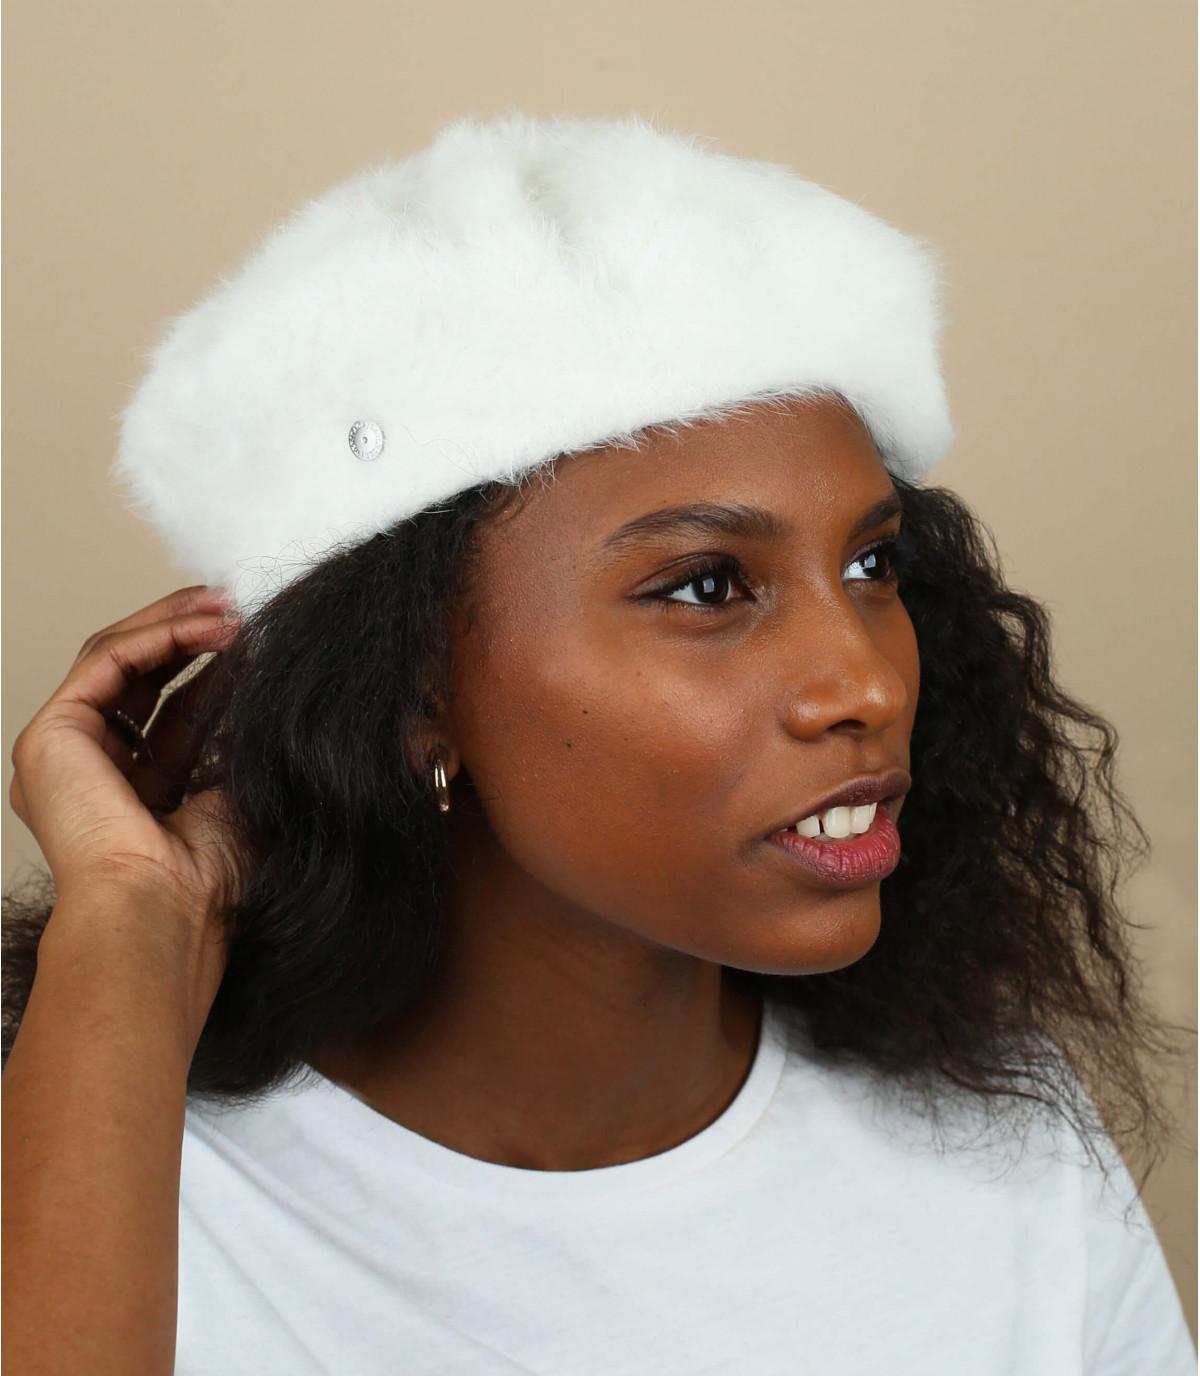 angora boina blanca Laulhère